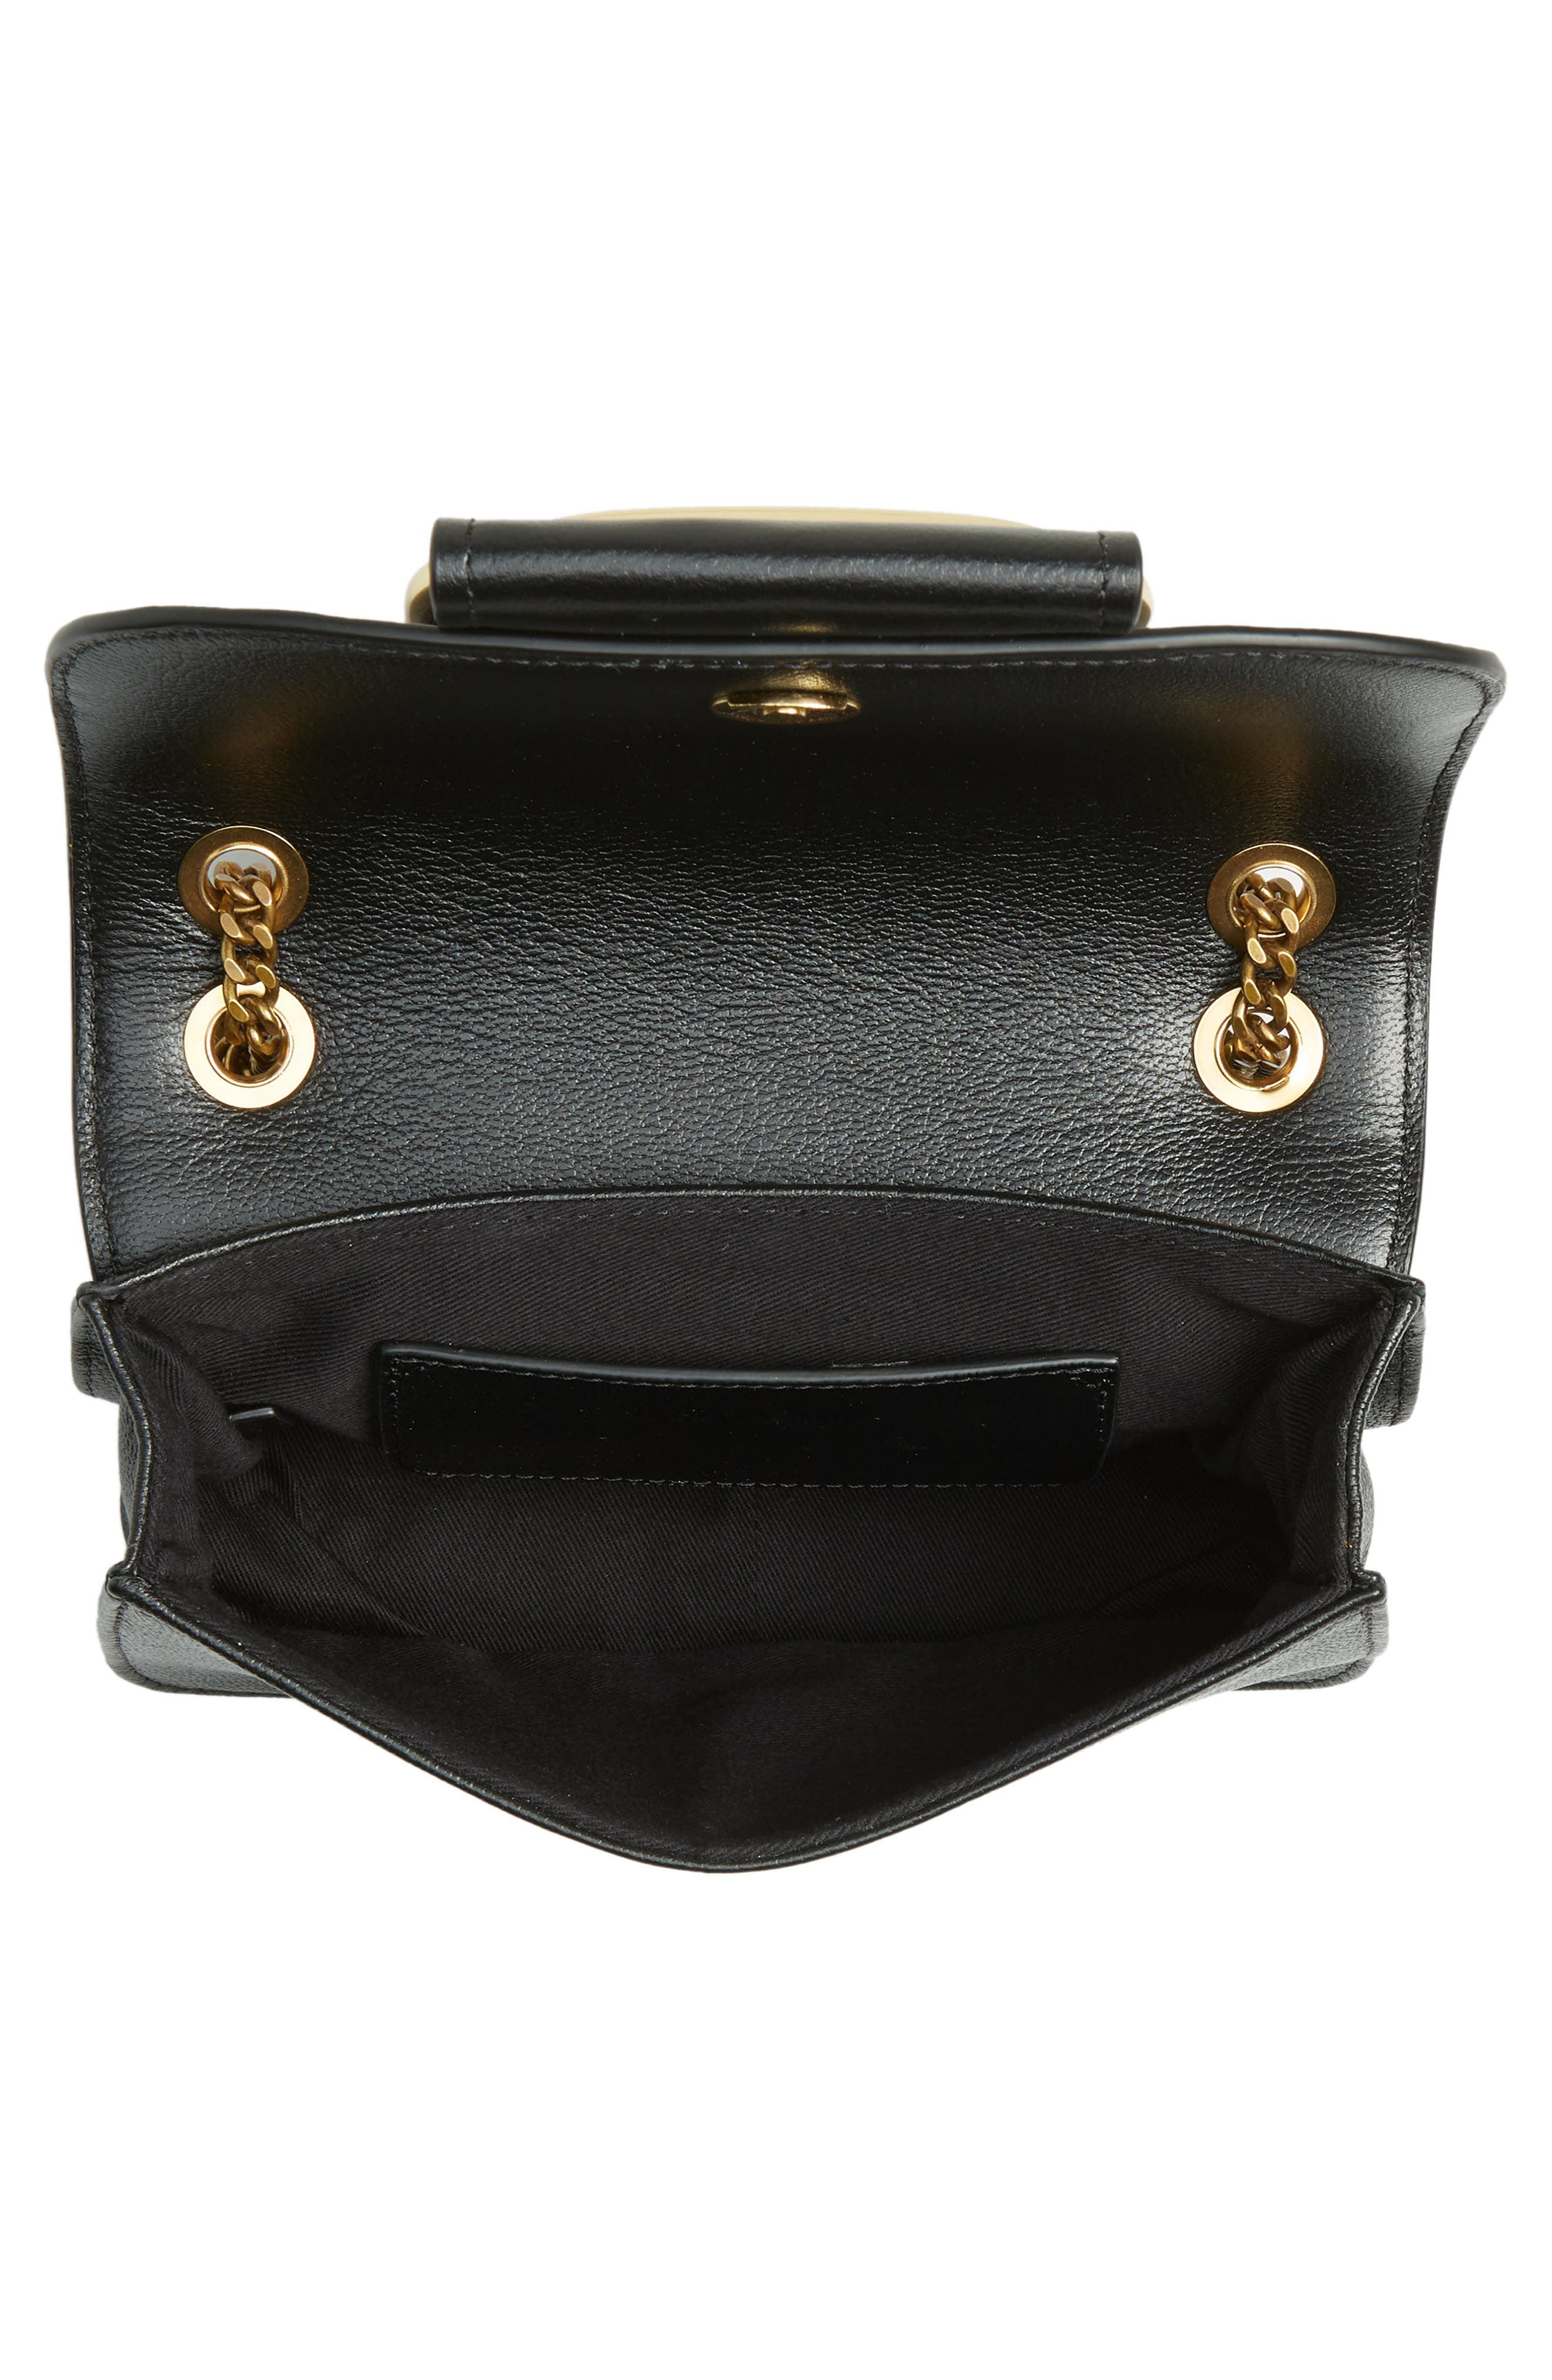 SEE BY CHLOÉ, Hopper Leather Shoulder Bag, Alternate thumbnail 5, color, 001